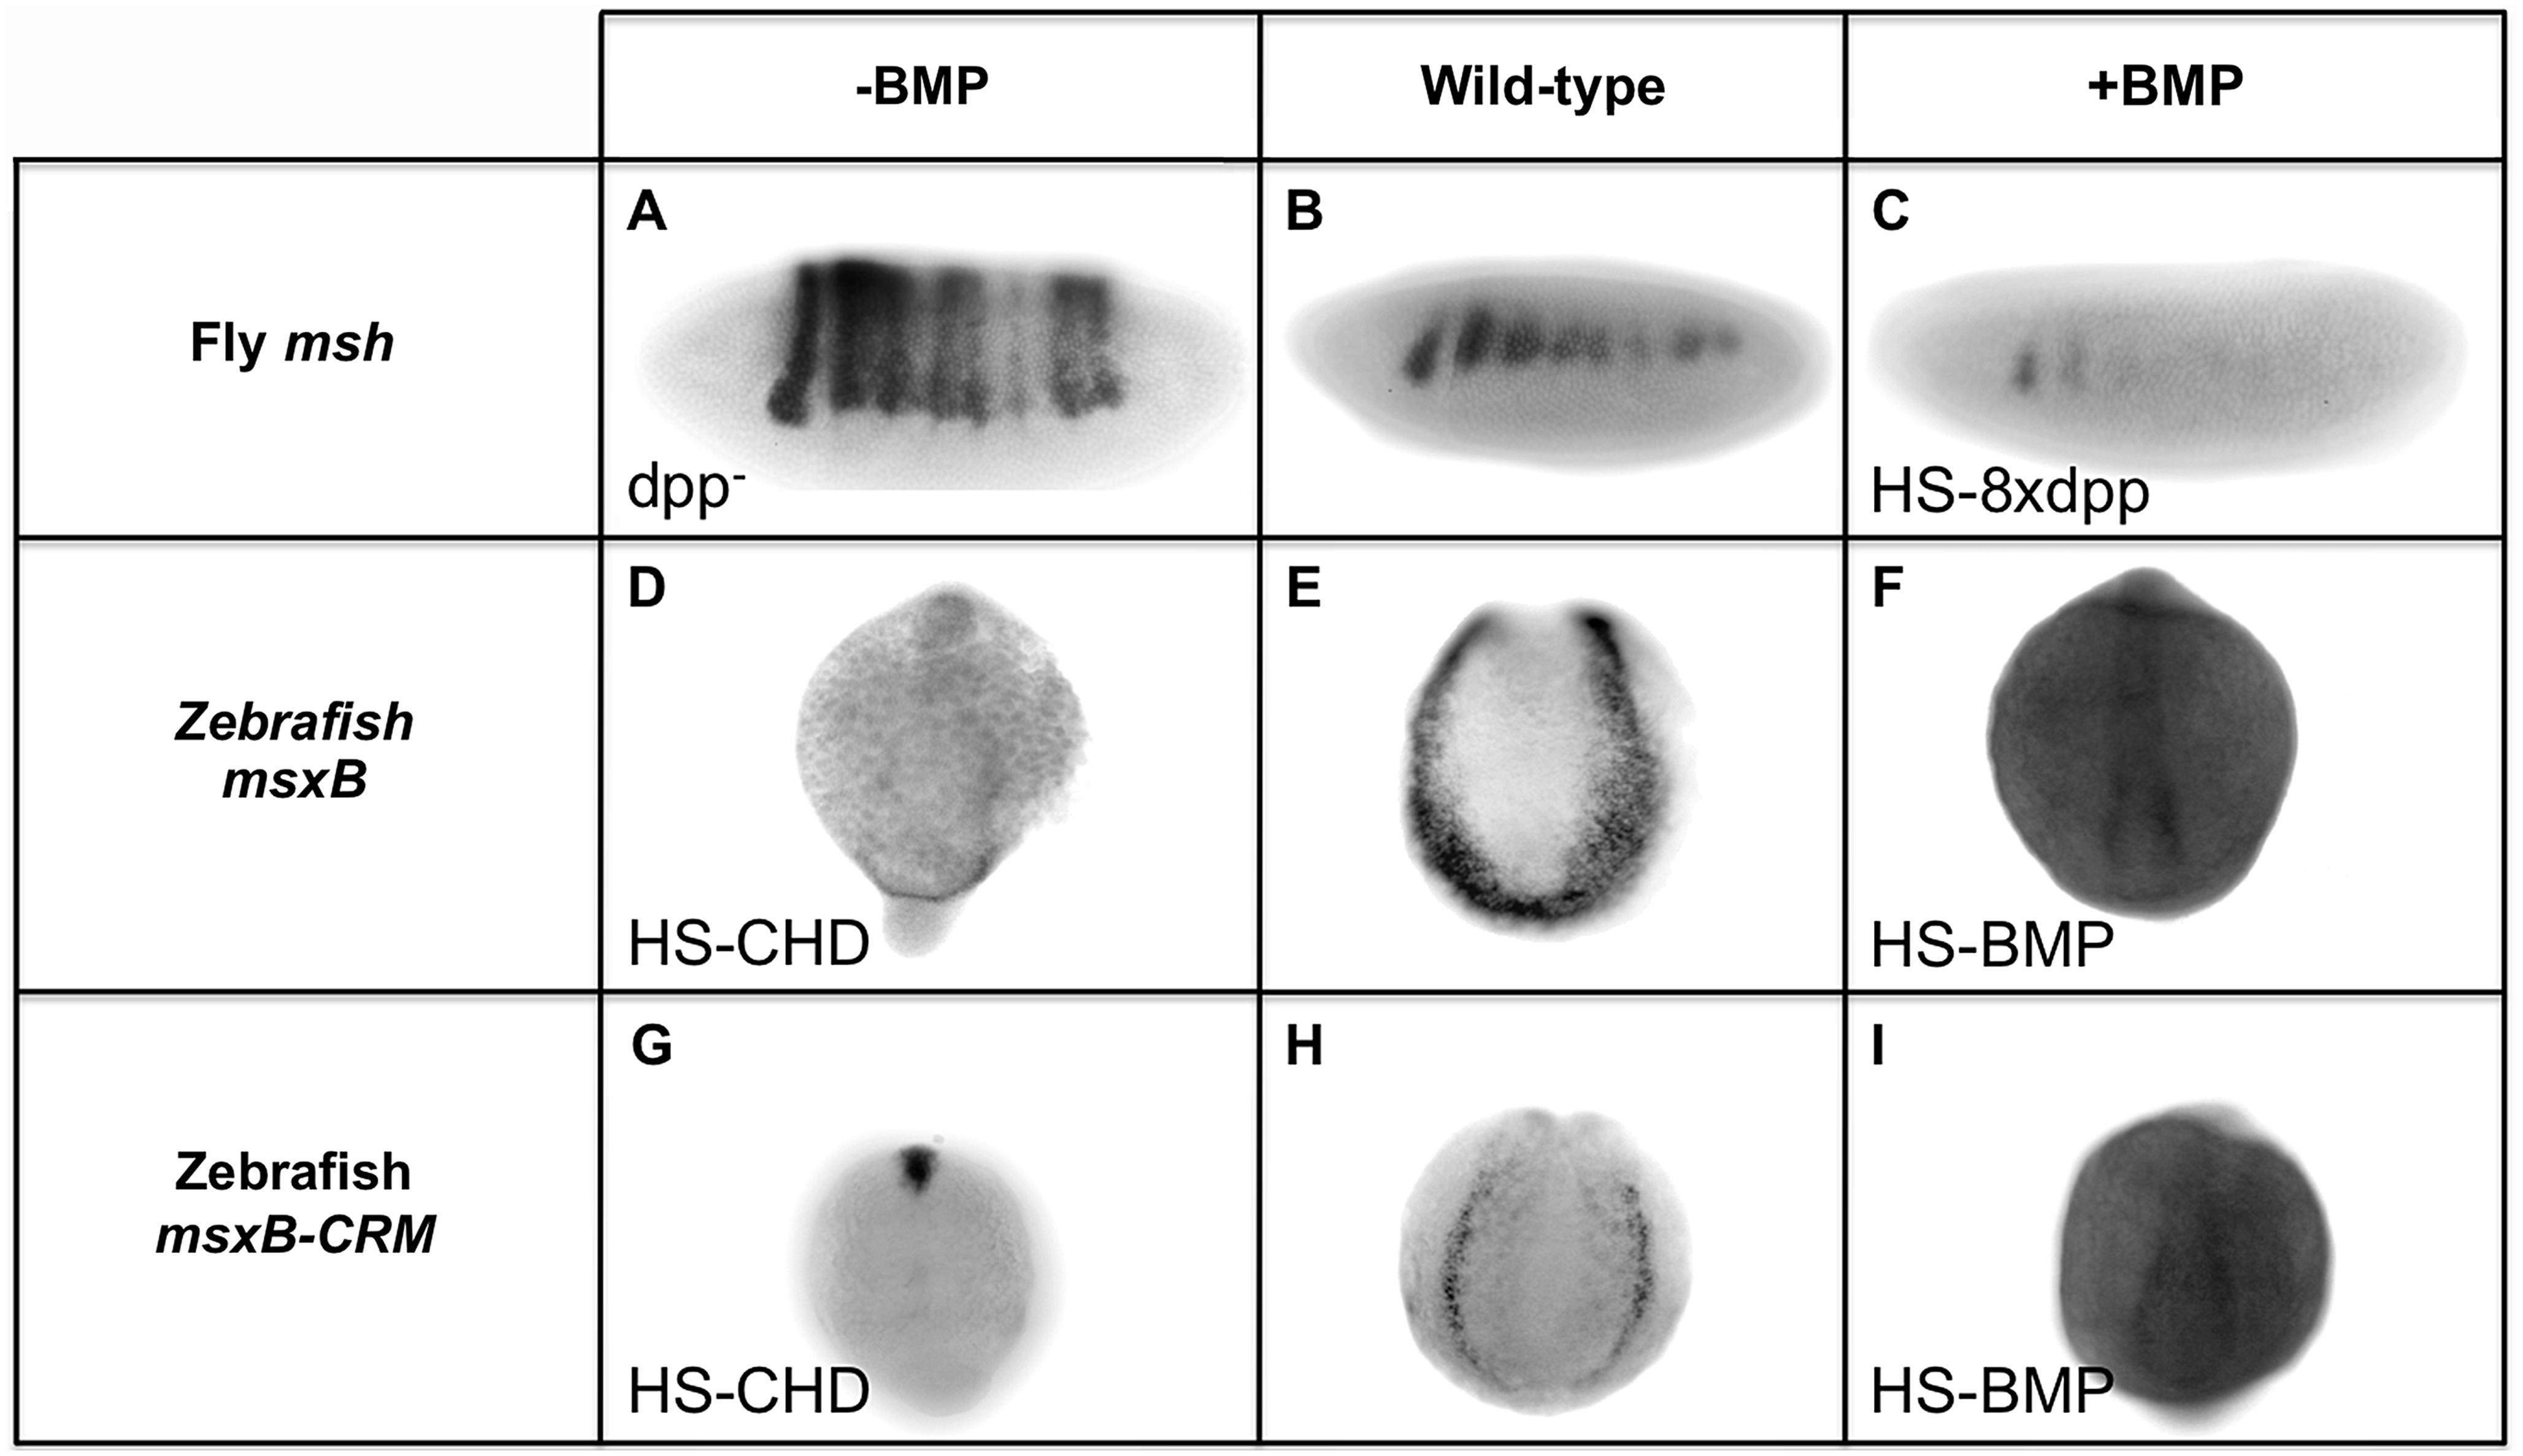 Manipulating BMP signaling elicits opposite responses from <i>msh</i> and <i>msxB</i> in <i>Drosophila</i> and zebrafish embryos.